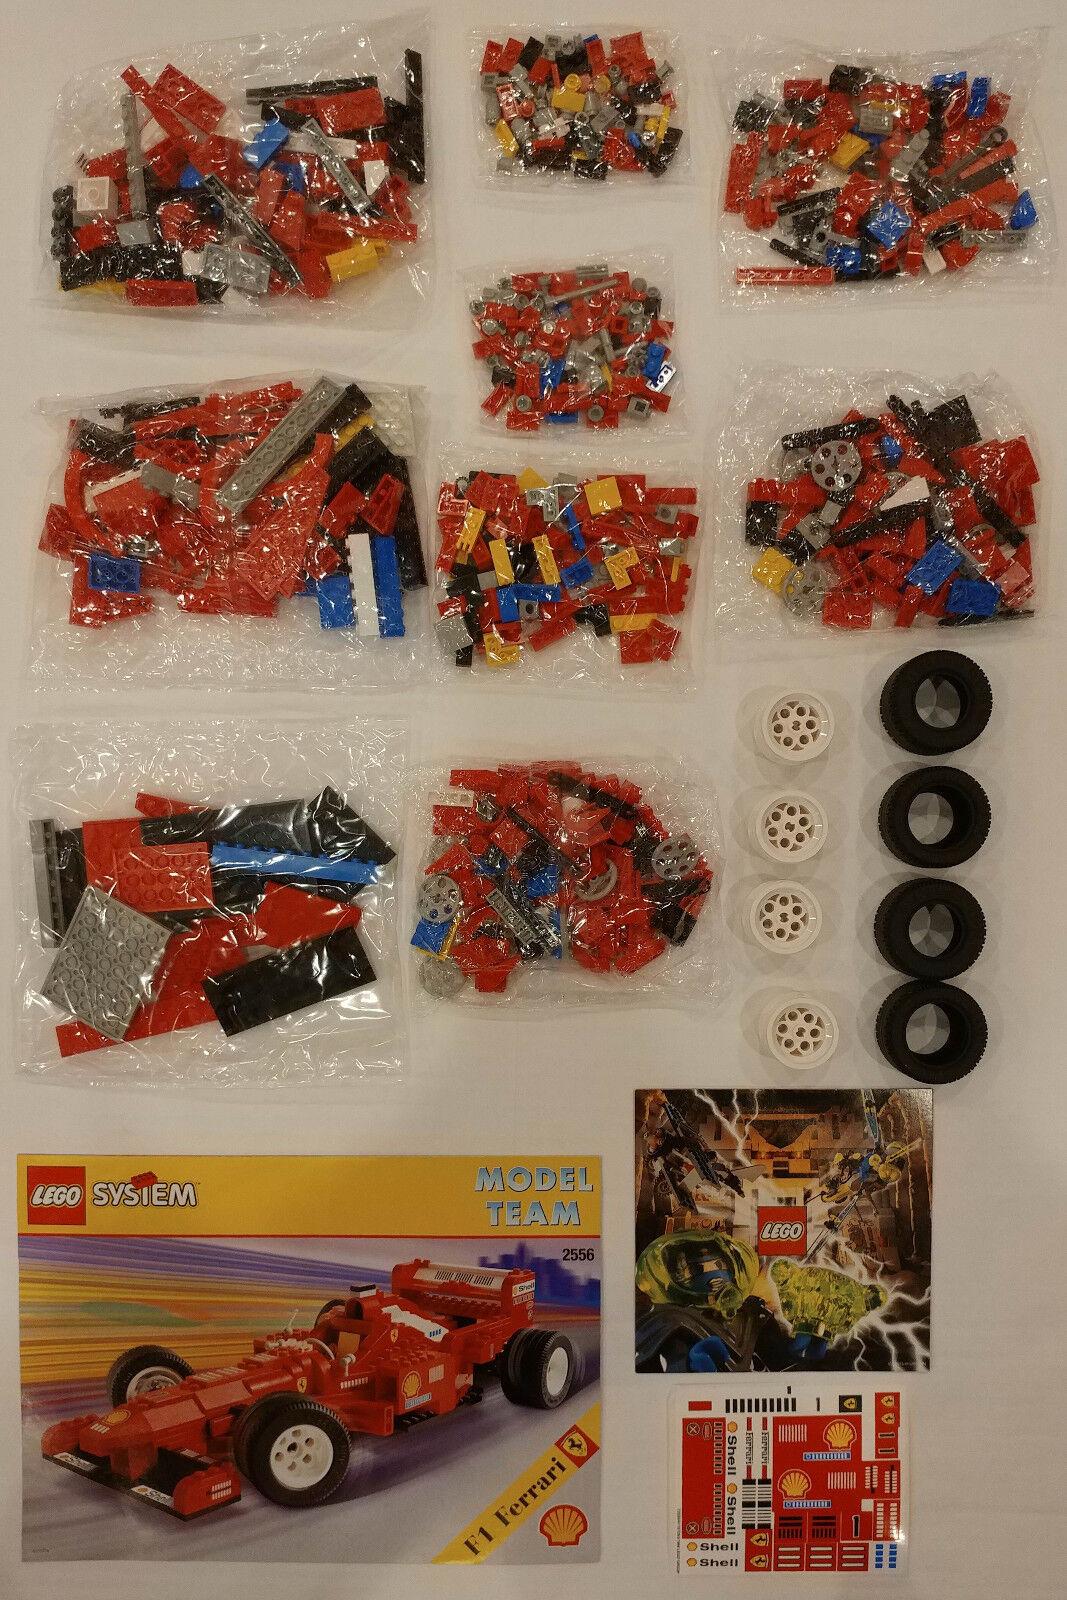 LEGO modellllerlerl Team Set 256 Ferrari Formel 1 tävlings bil Race Shell F1 - Ny ruta